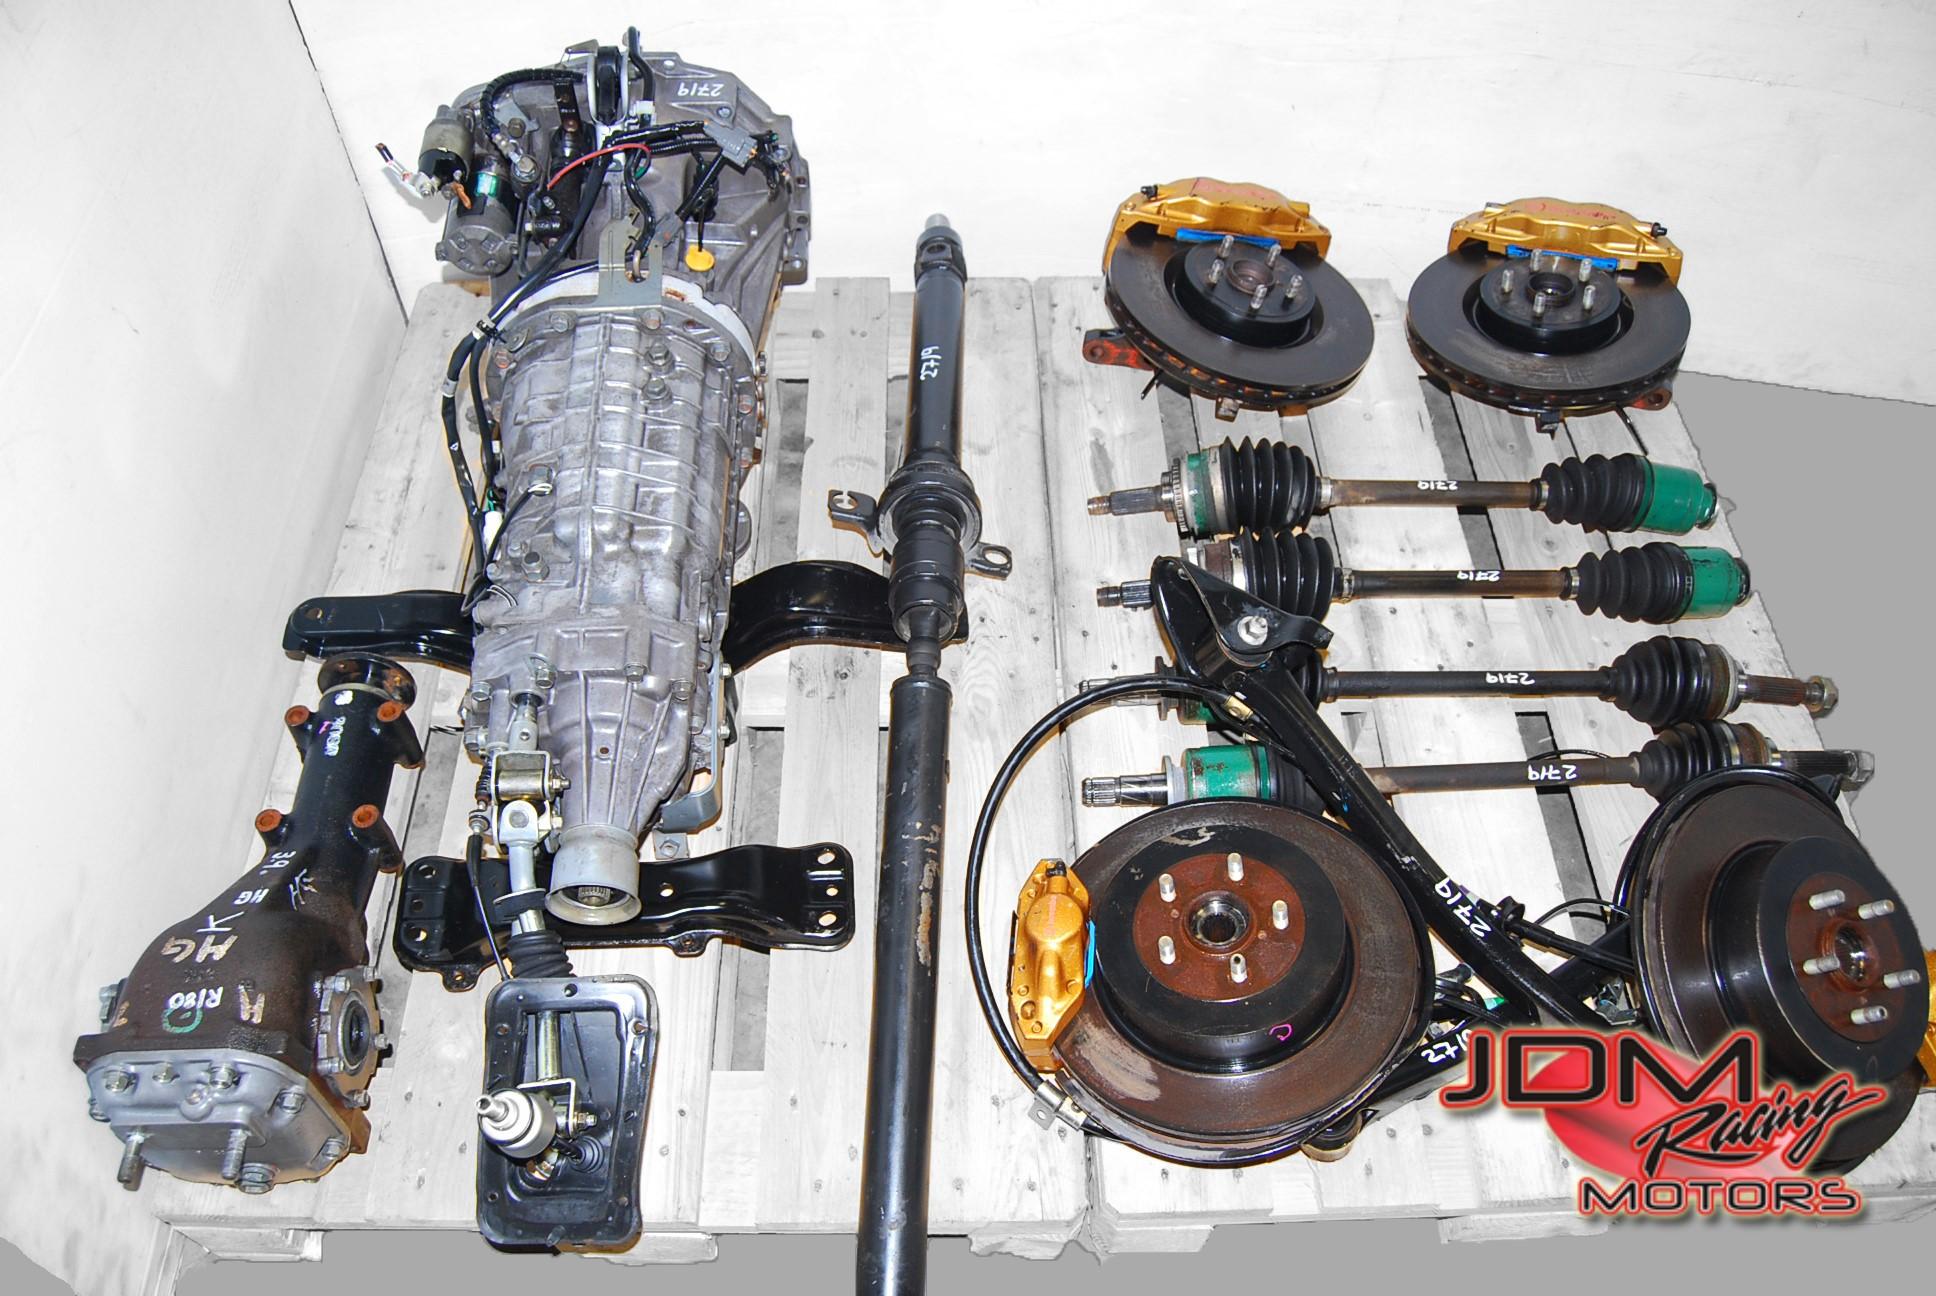 Subaru Jdm Engines Parts Racing Motors 97 Impreza Engine Diagram 6 Speed Sti Transmissions 22 Item Title Wrx 5mt Manual